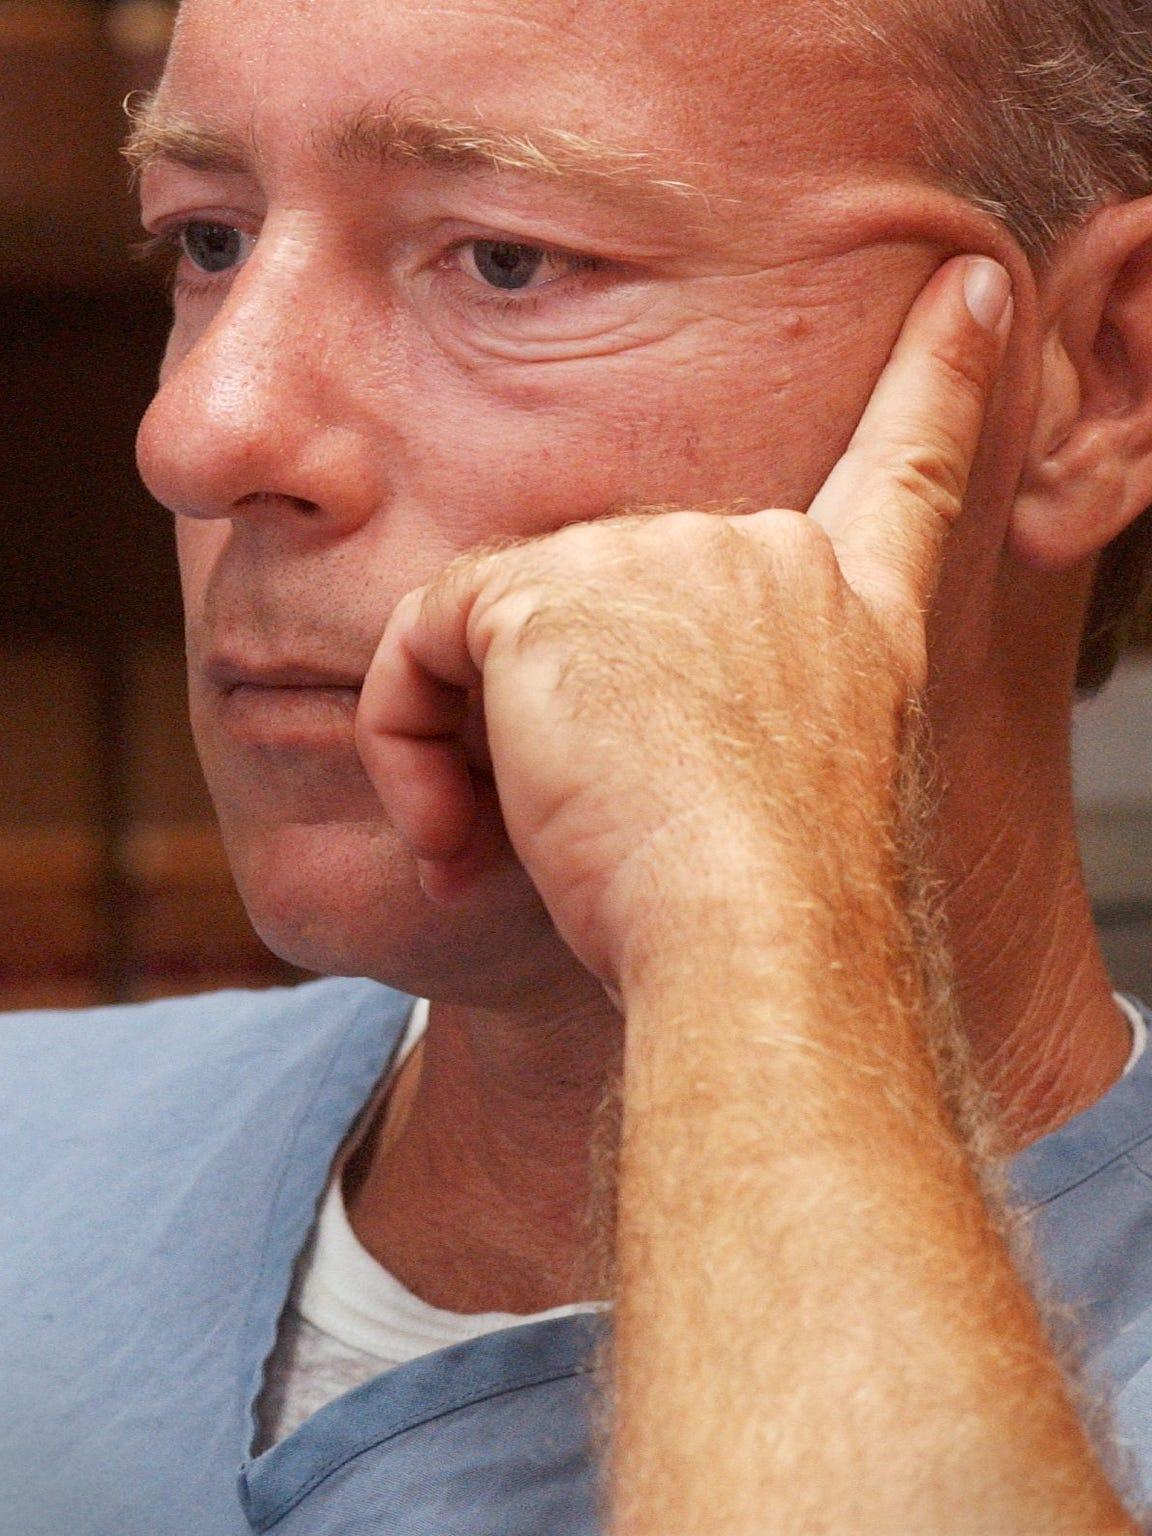 FILE: 9/18/02--Wilton Dedge was convicted of rape.